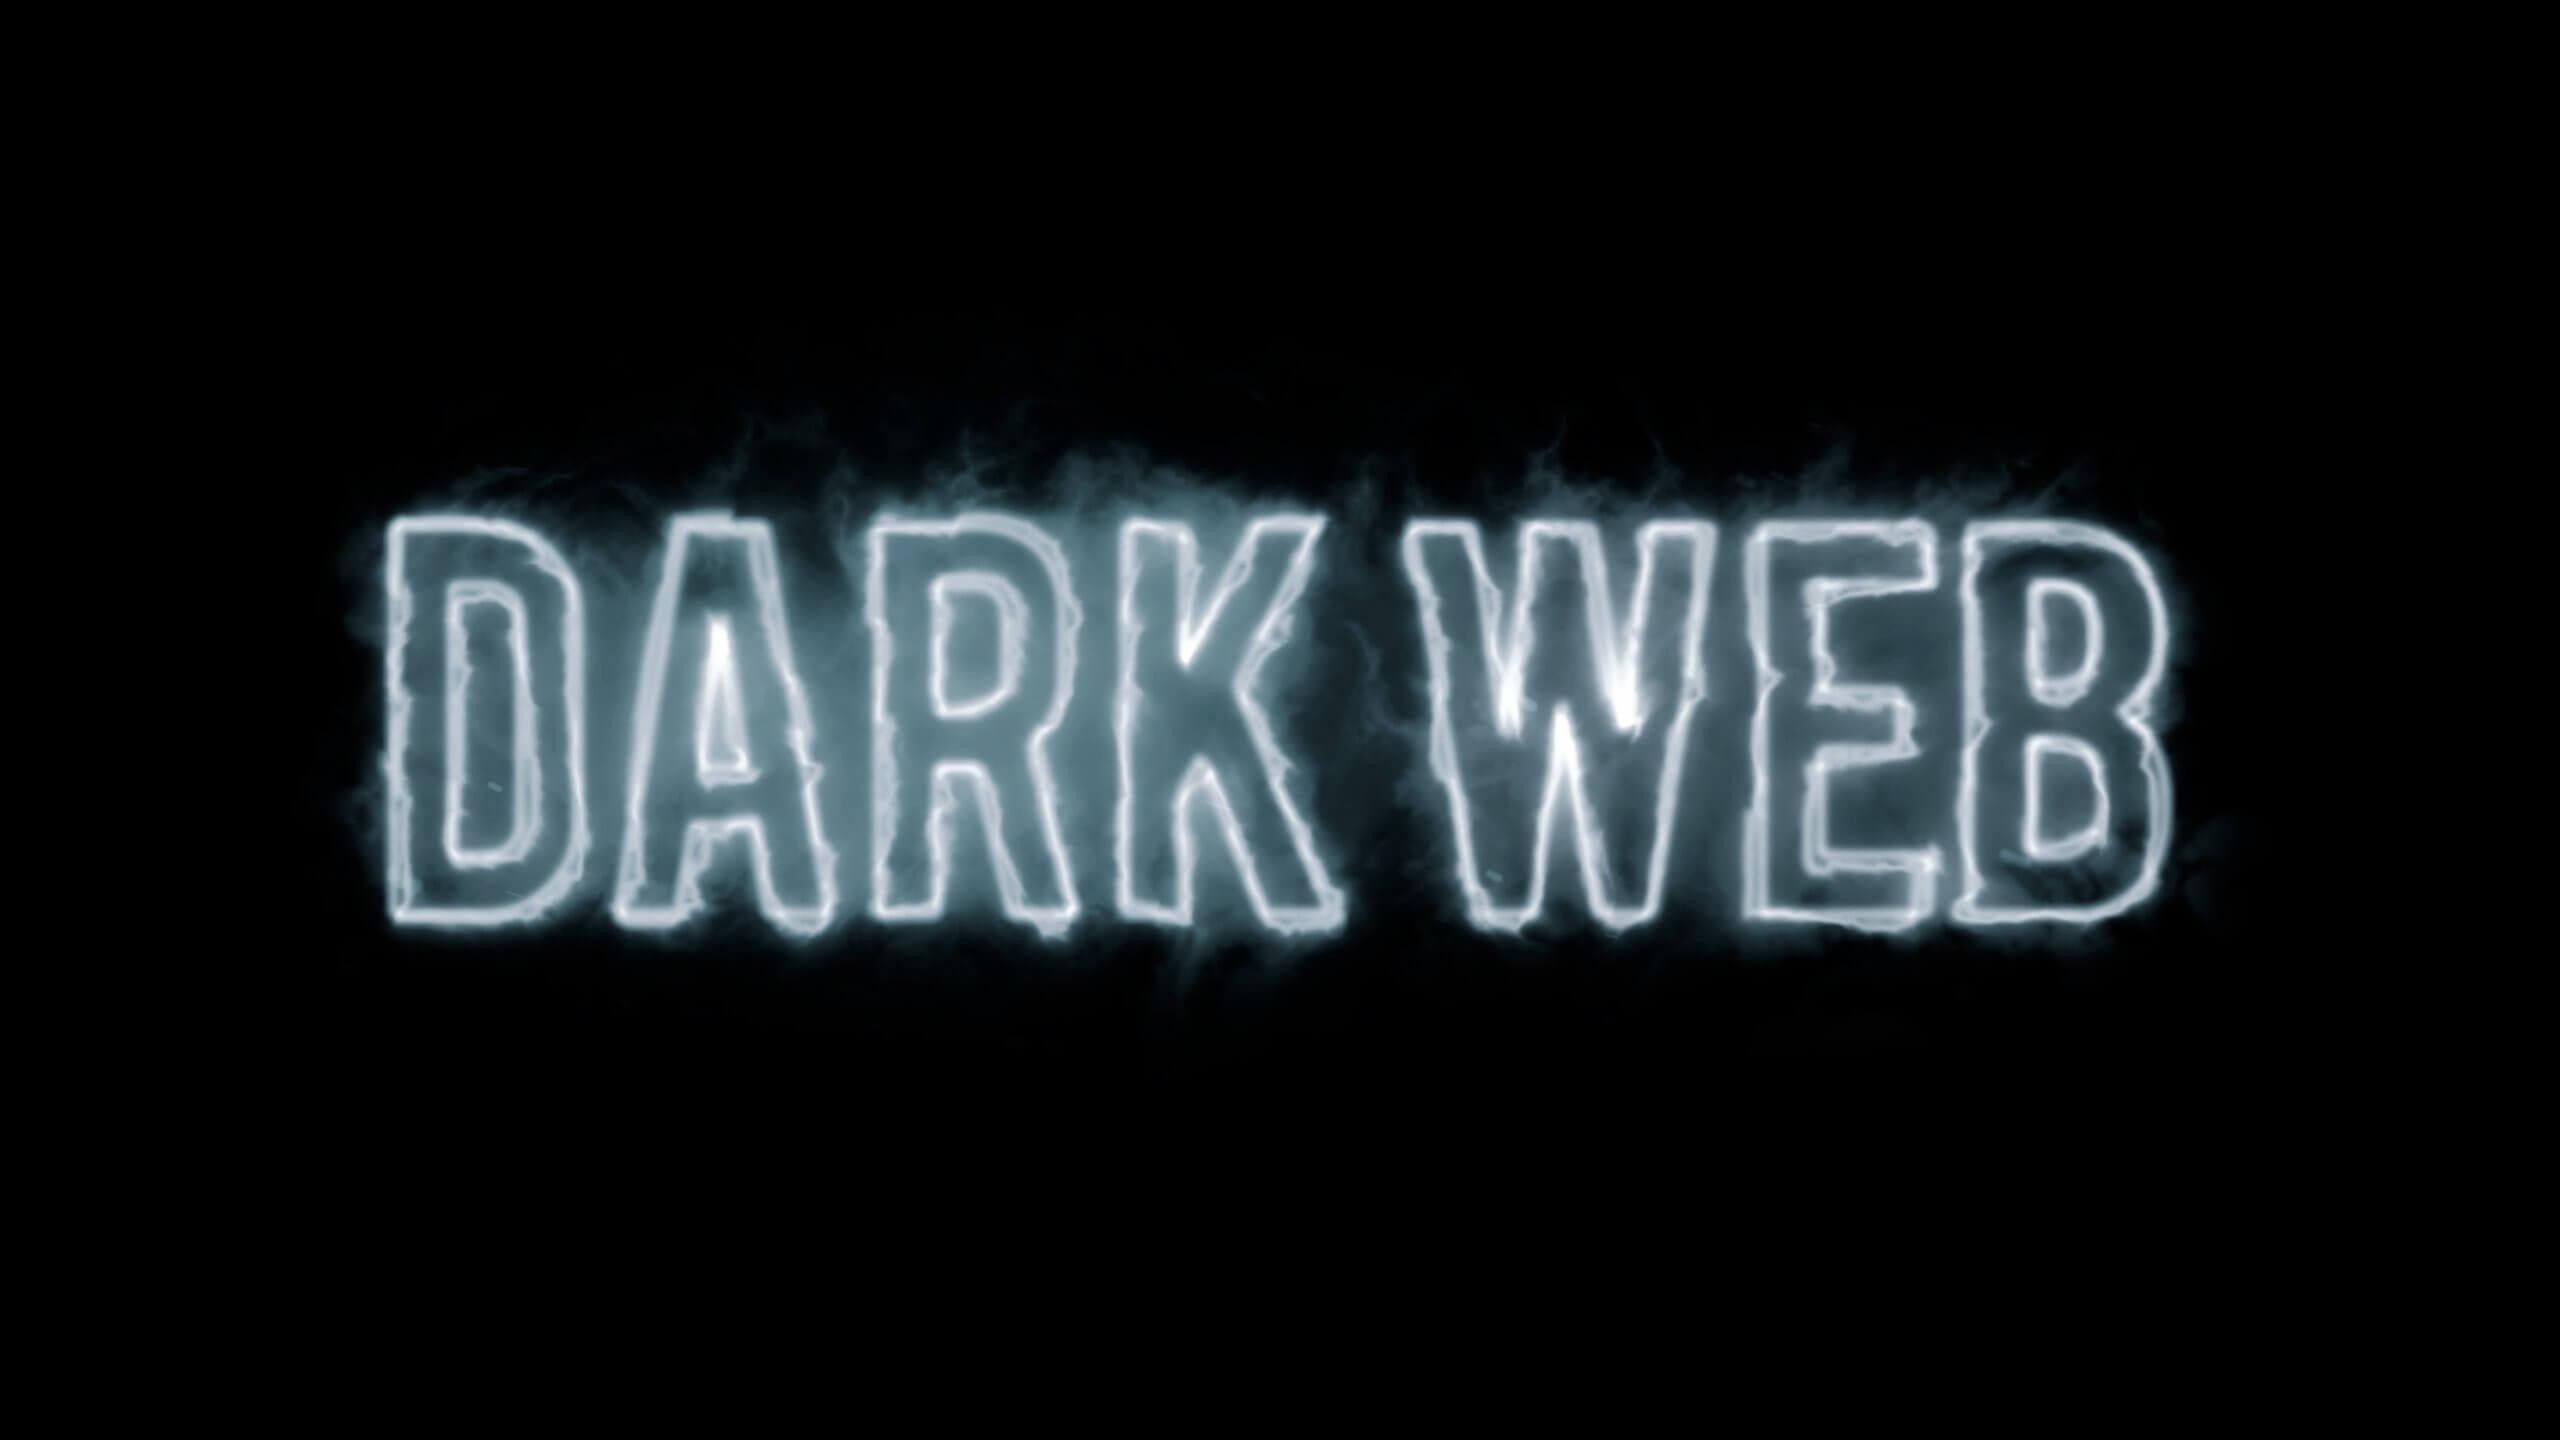 Dark web - Bitcoin activity increased